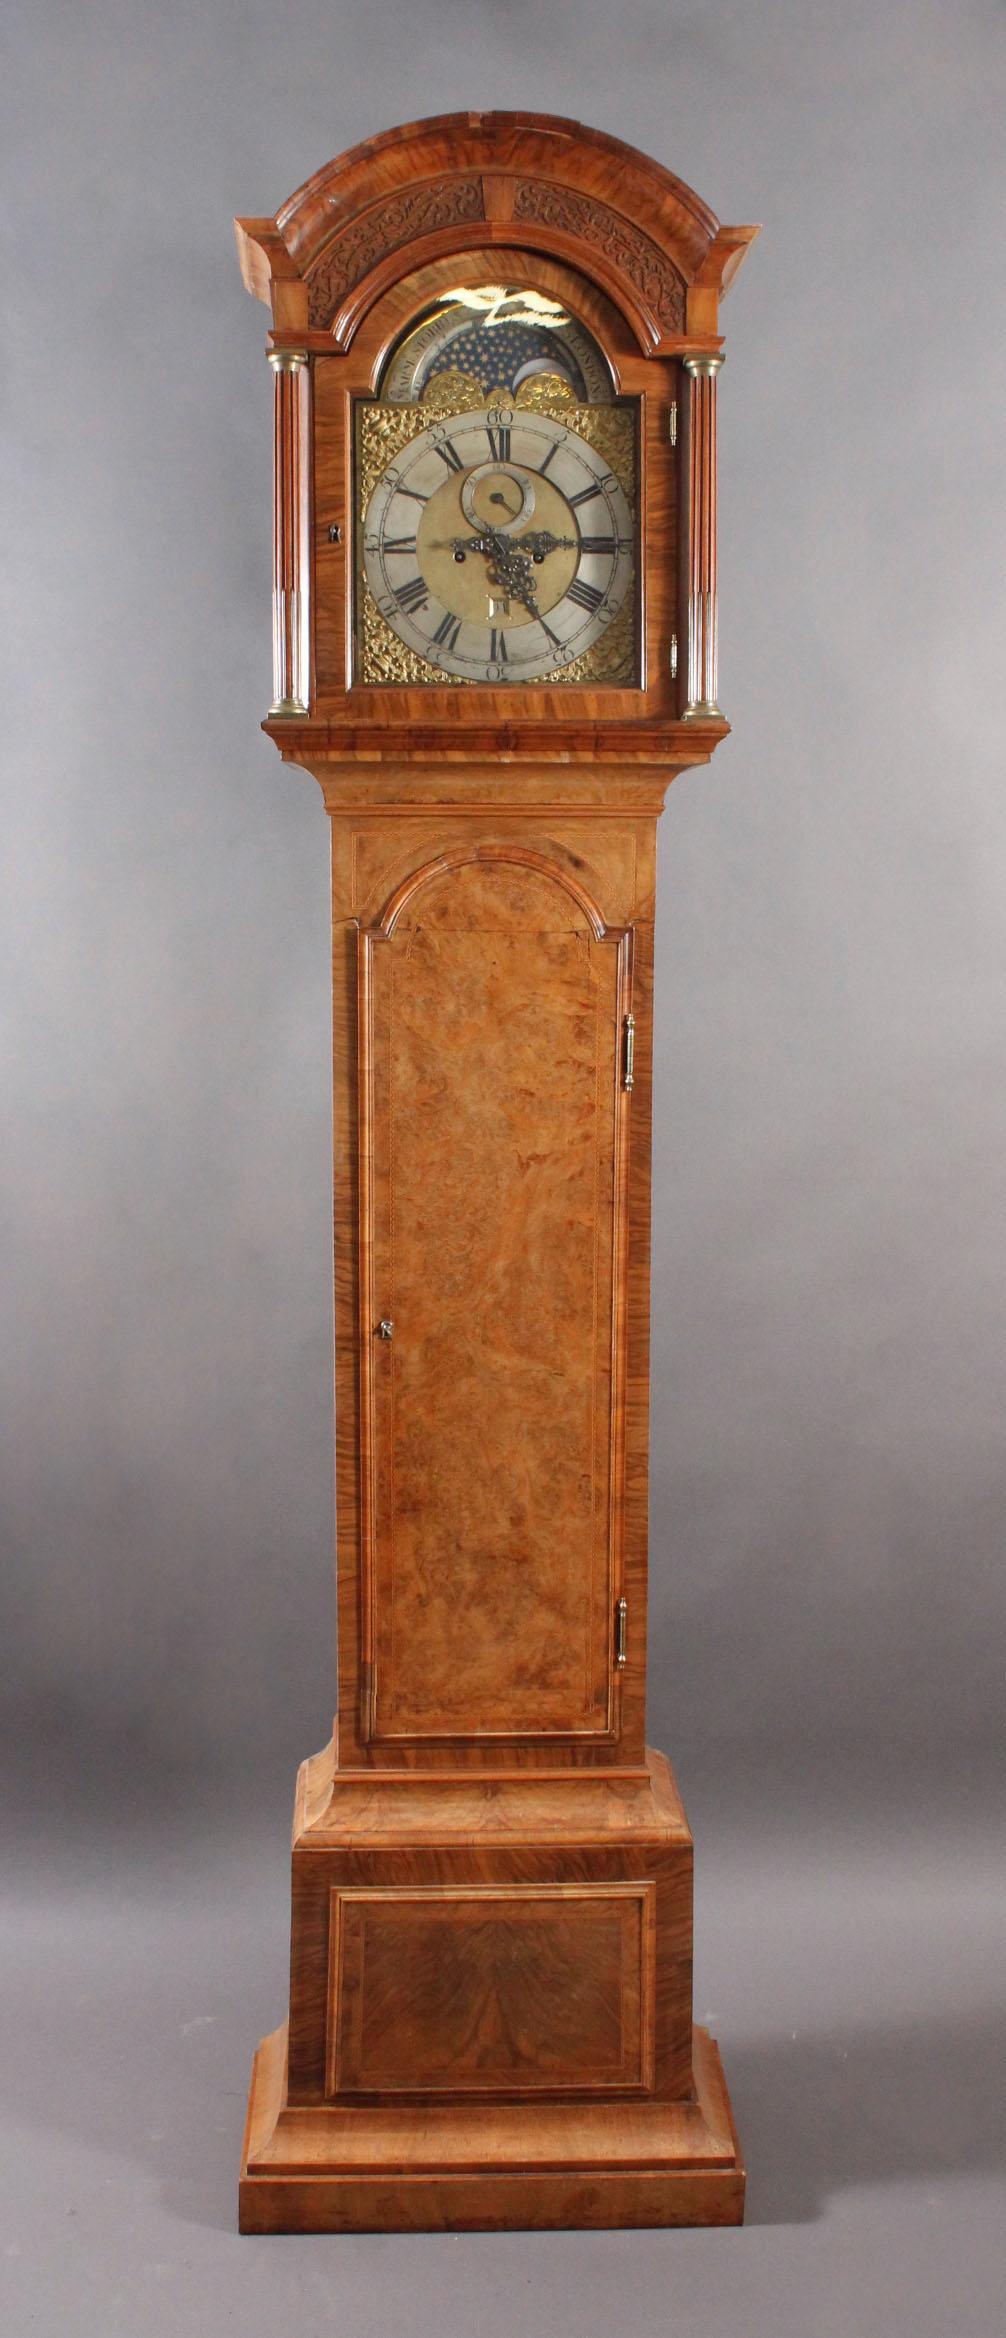 Barocke Standuhr, 18. Jh., Mondphase, Marm Storr London